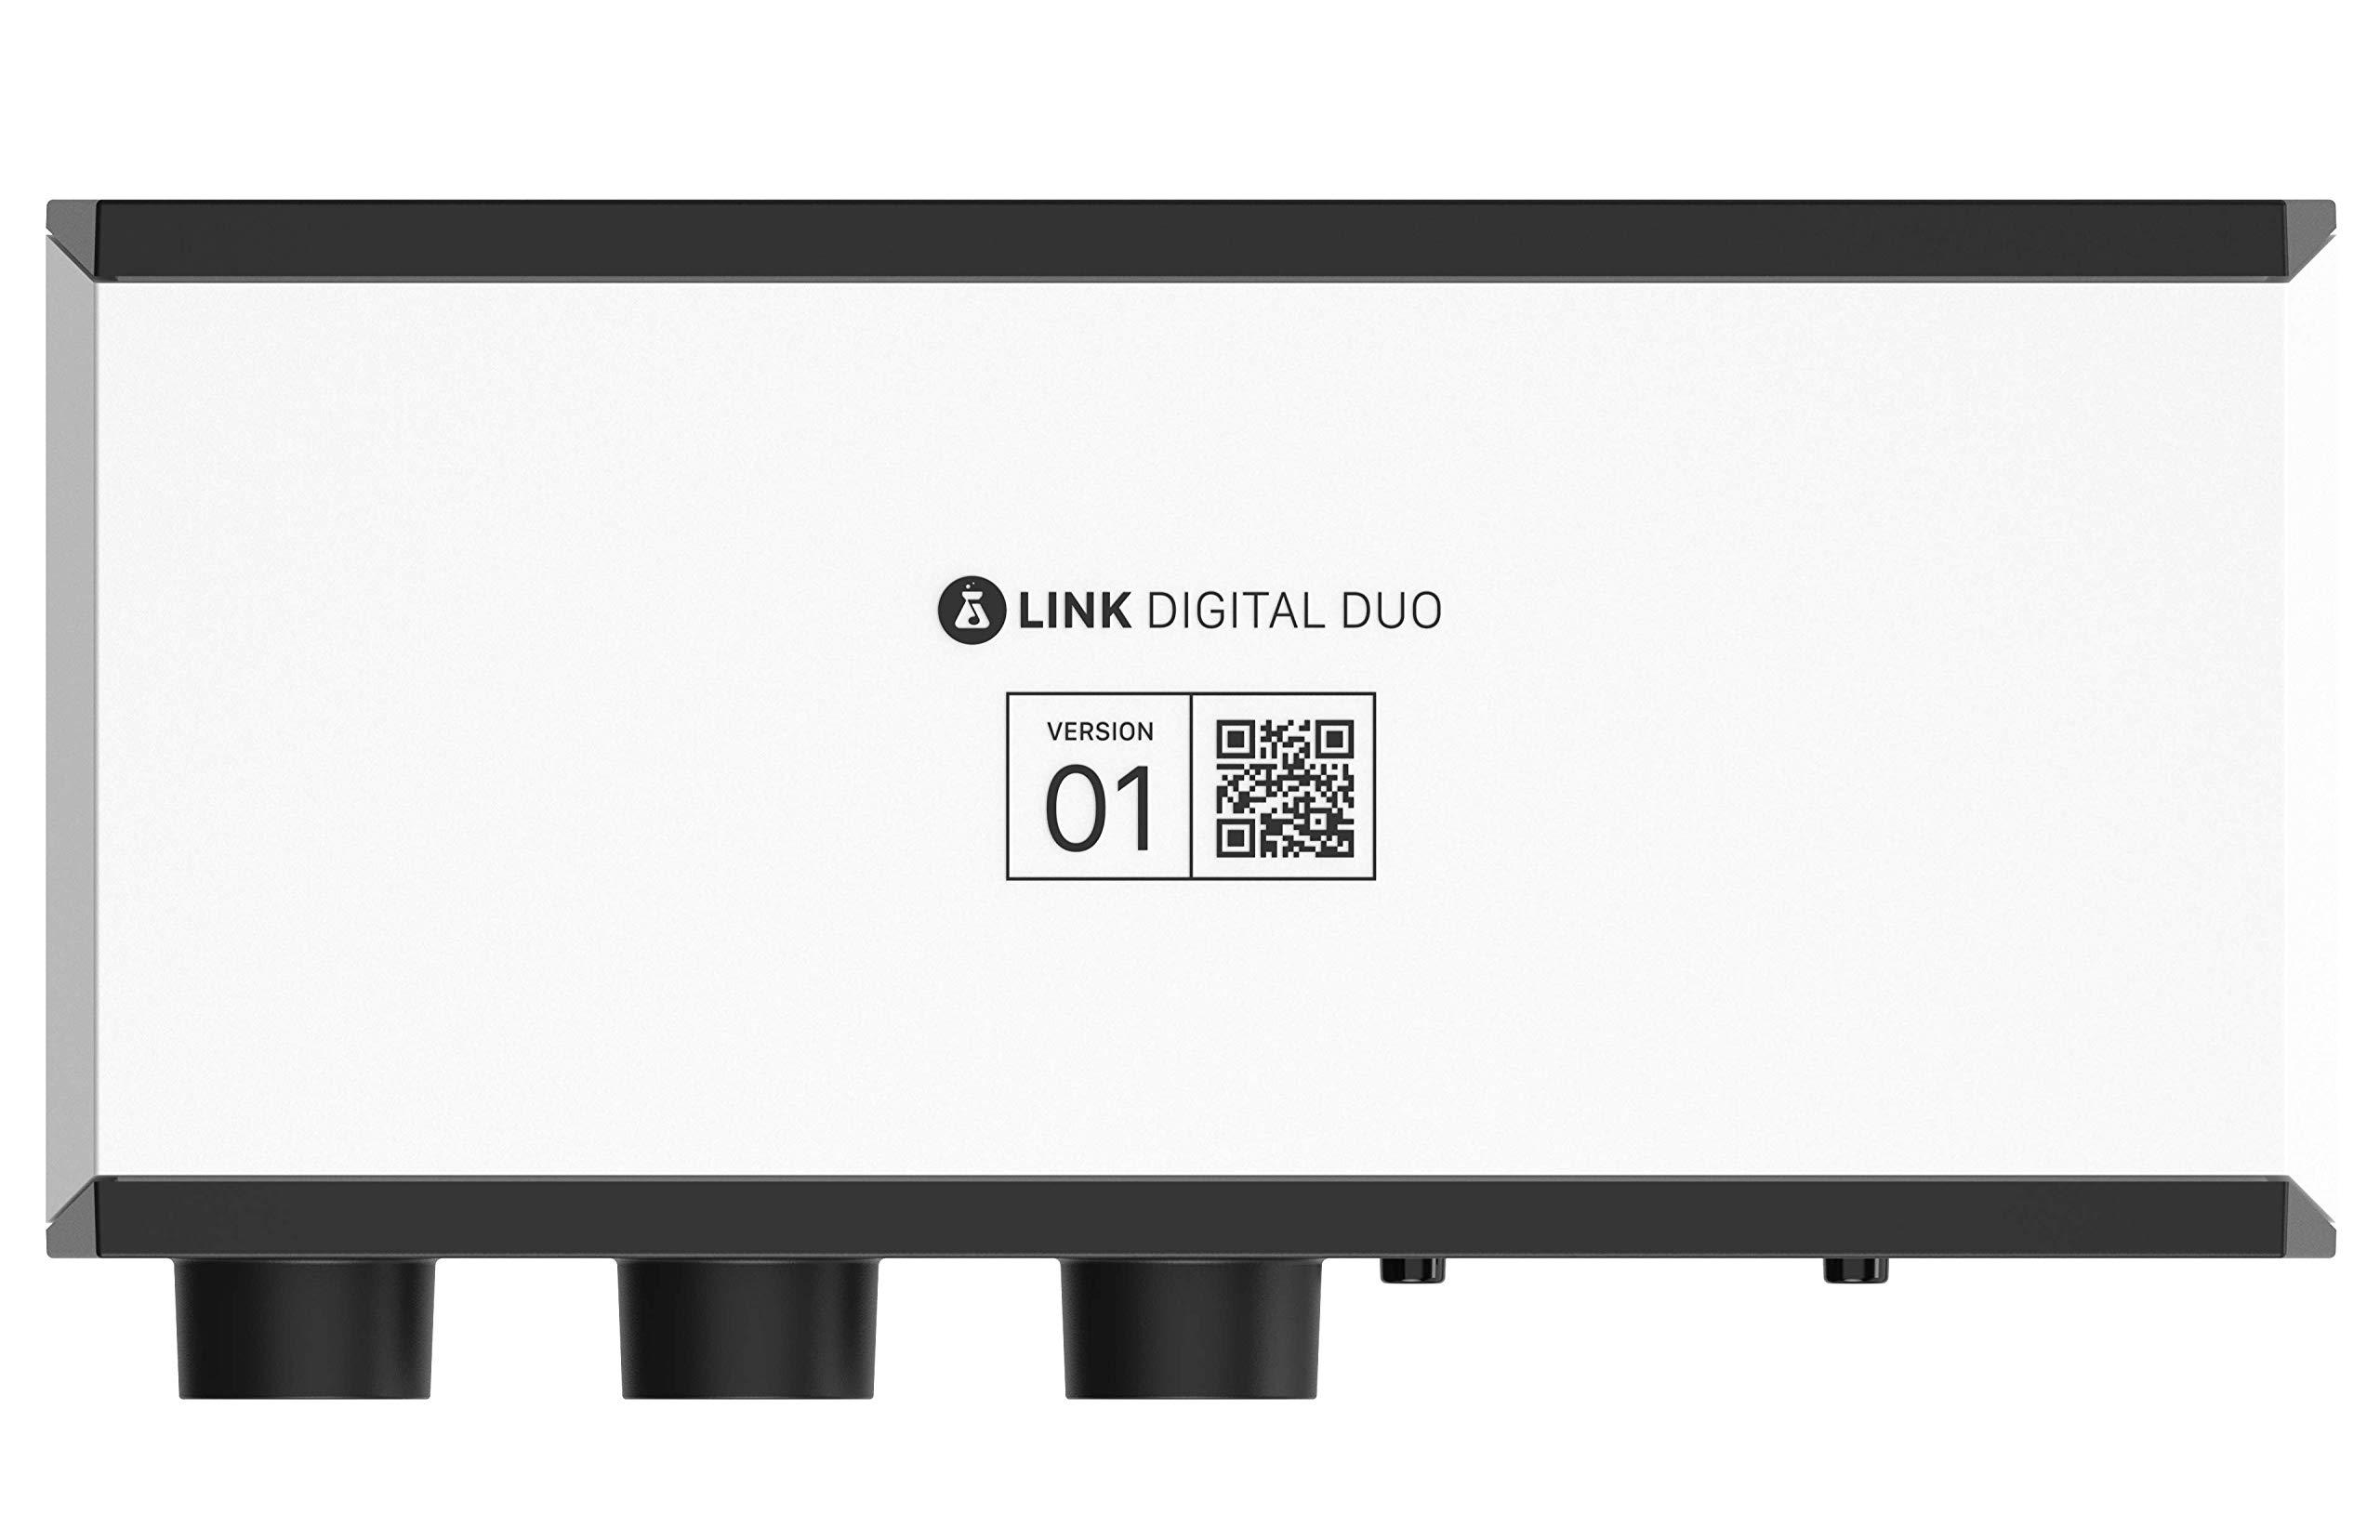 BandLab Link Series Audio Interface (BLB-01102)